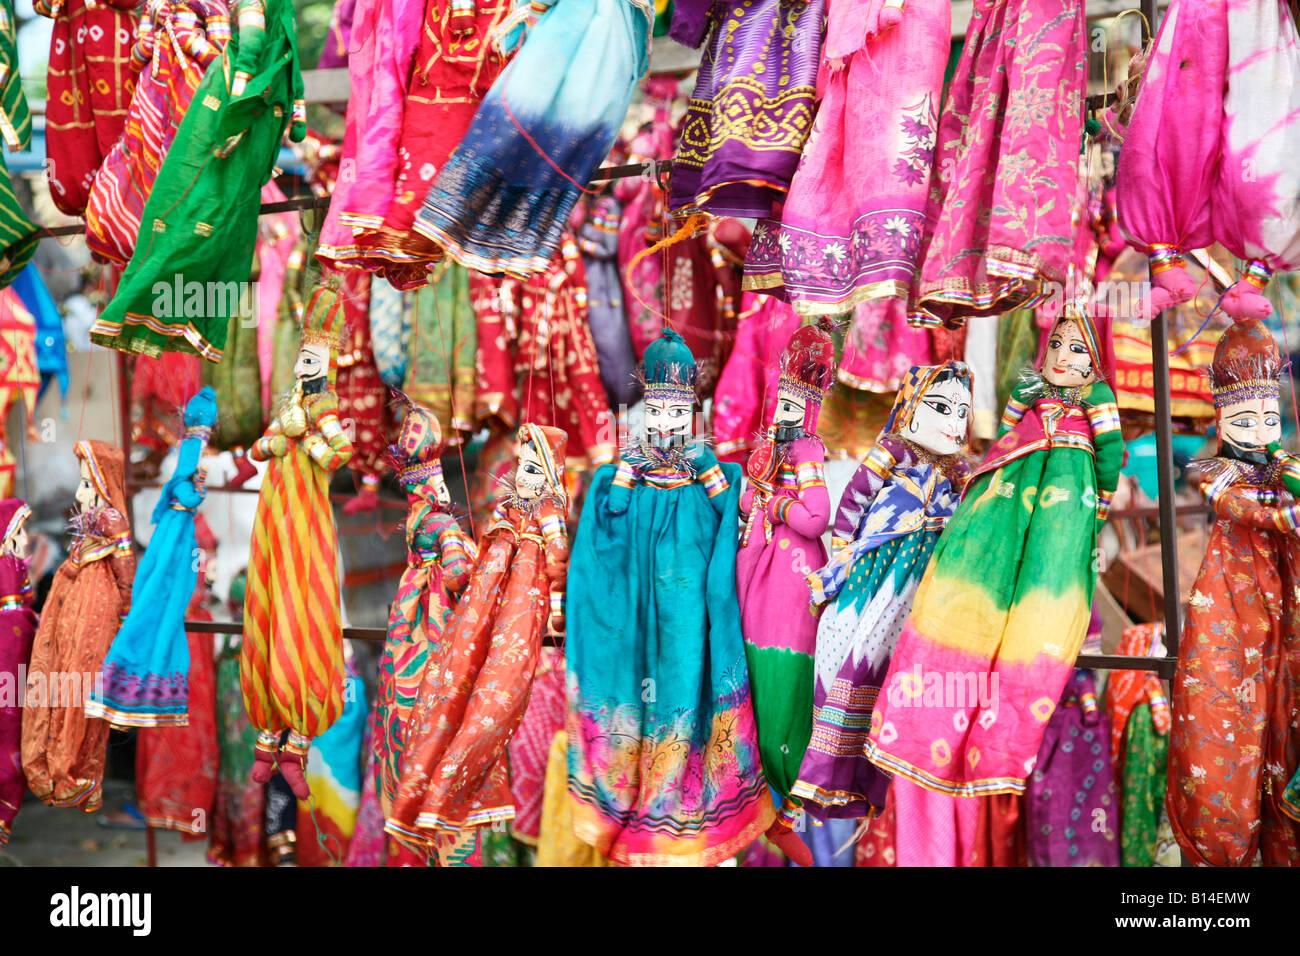 Rajasthani Handicrafts Stock Photos Rajasthani Handicrafts Stock